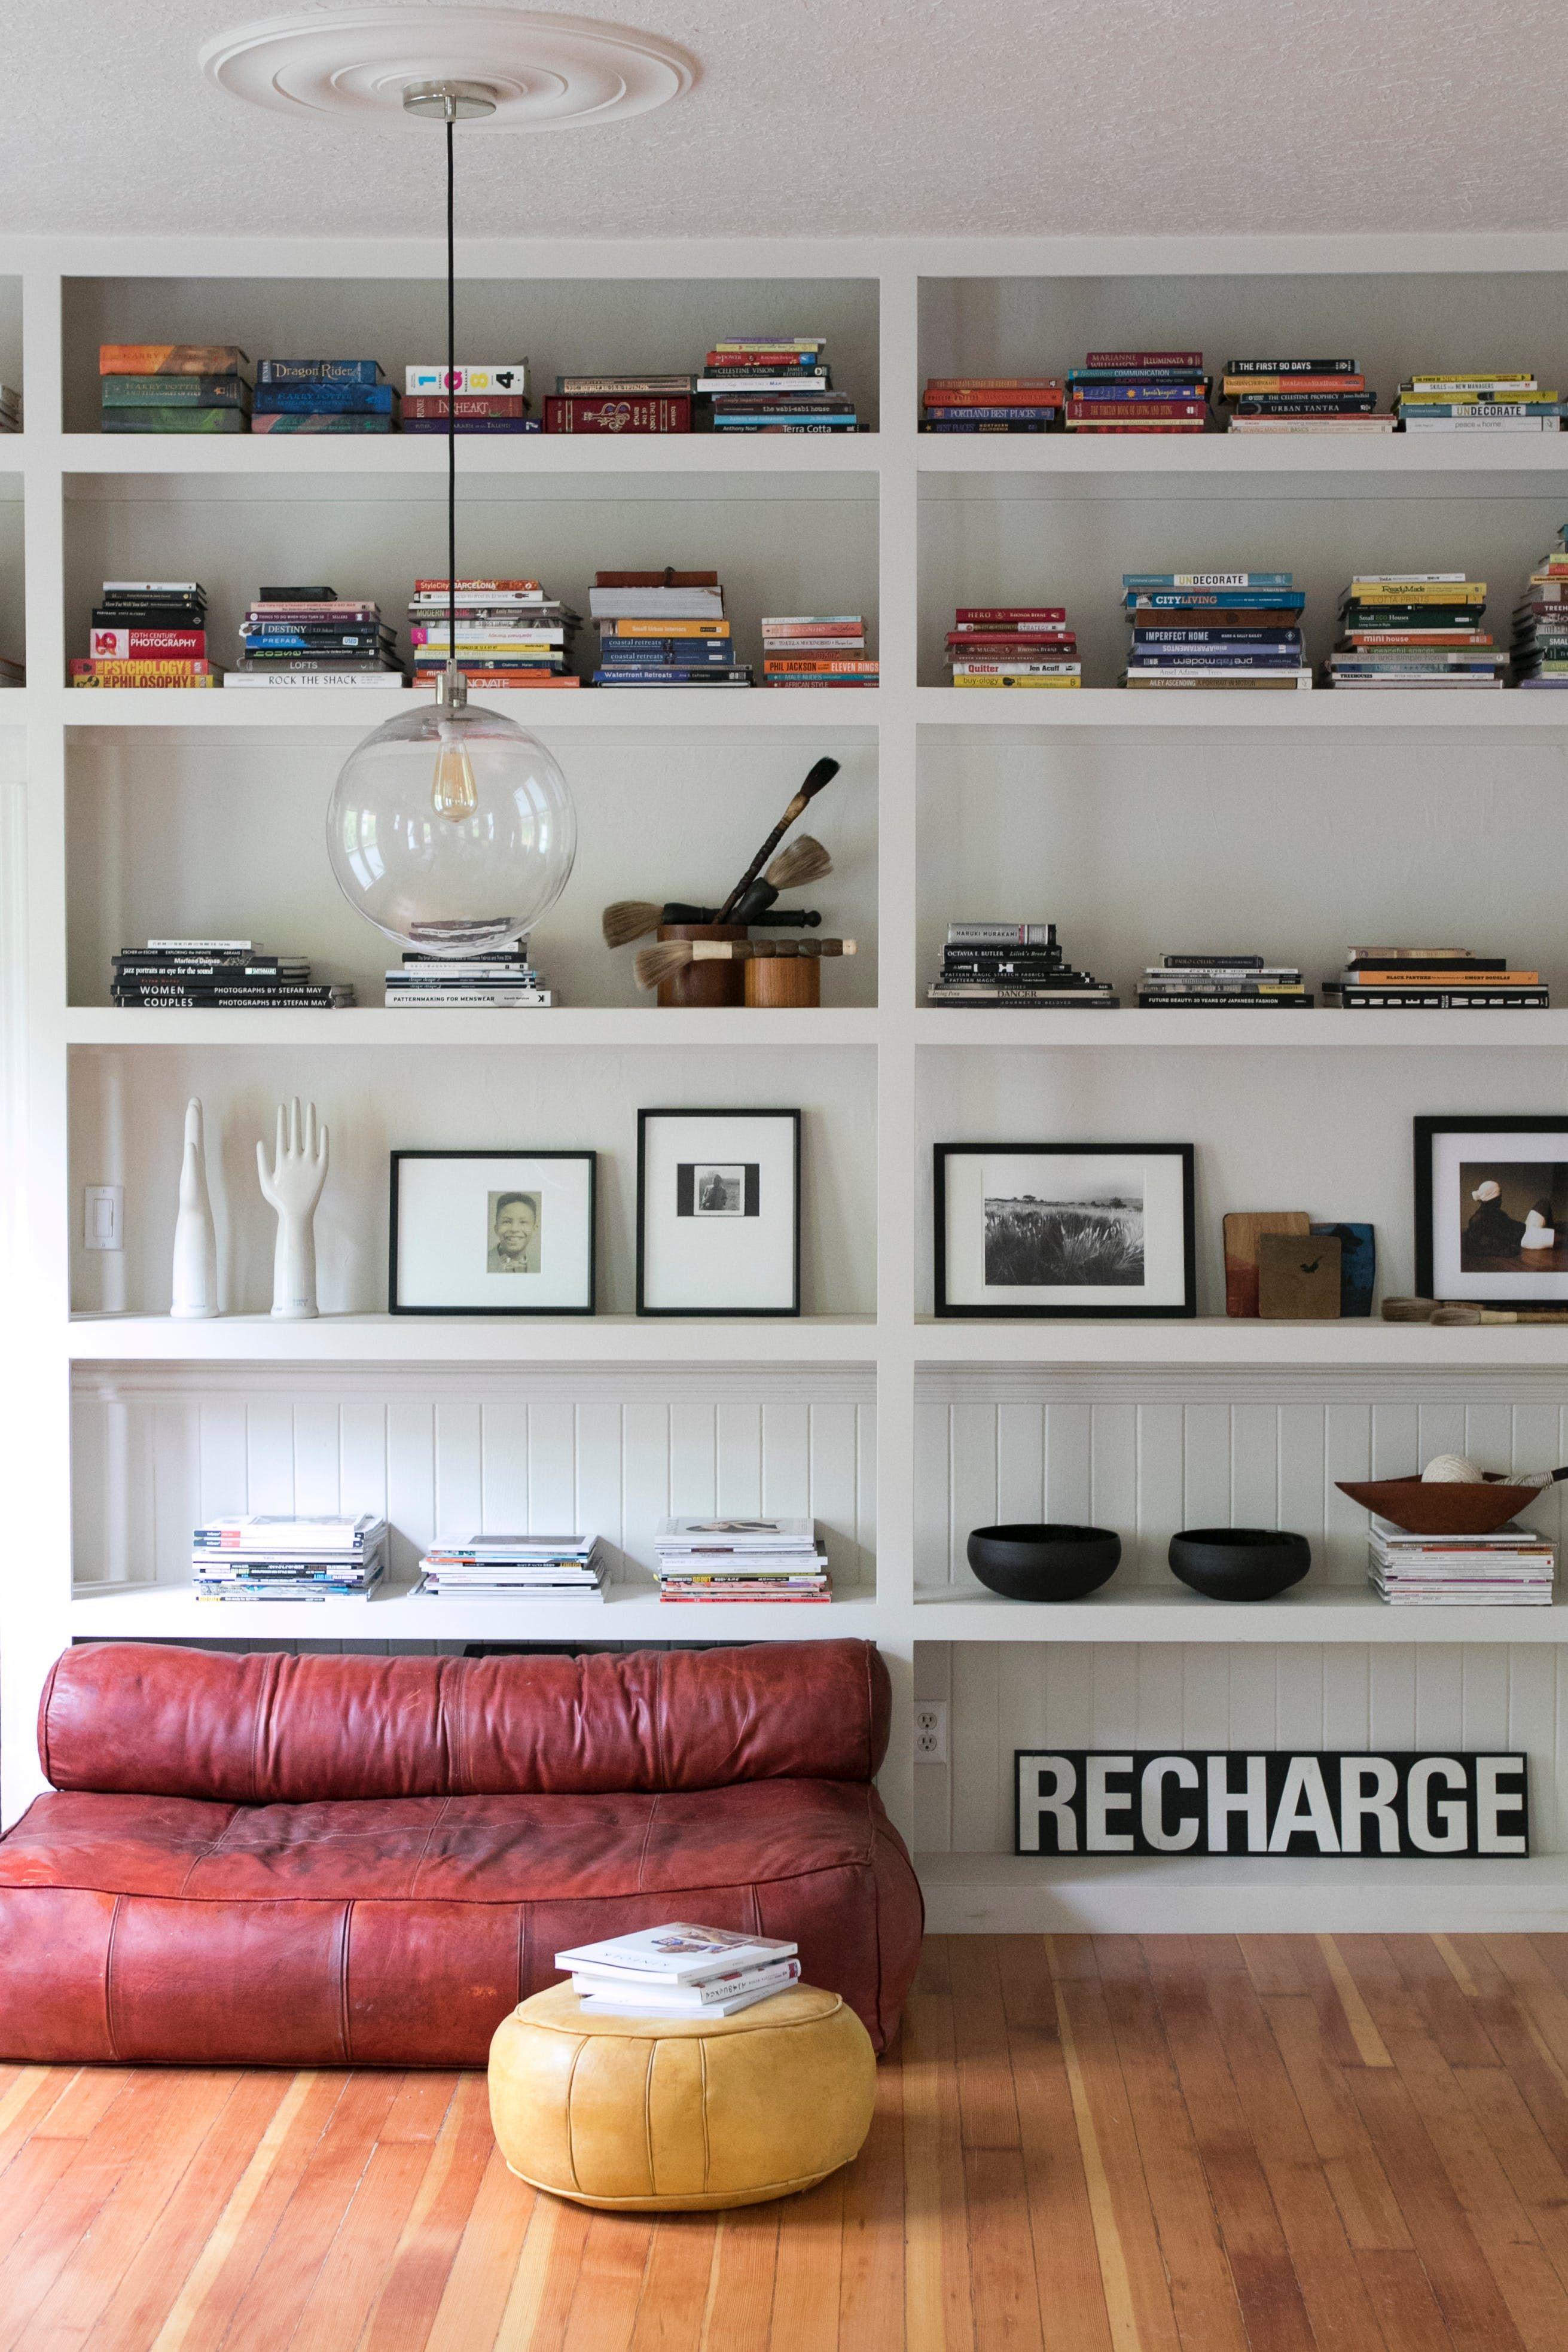 A wonderful remodeled portland home embraces wabisabi apartments